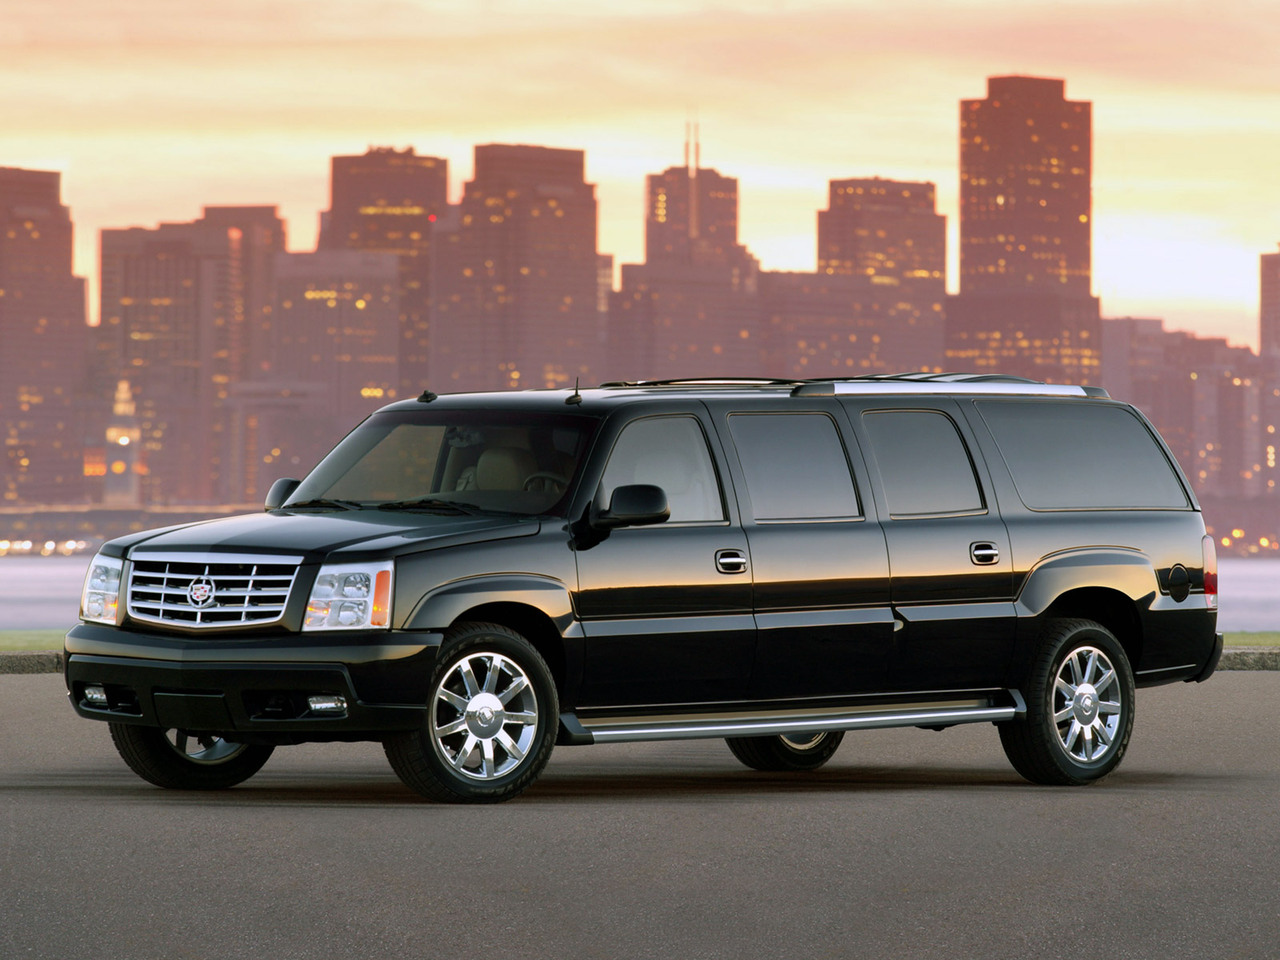 Www Hummer Limousine Car Wallpapers Com Cadillac Escalade Esv